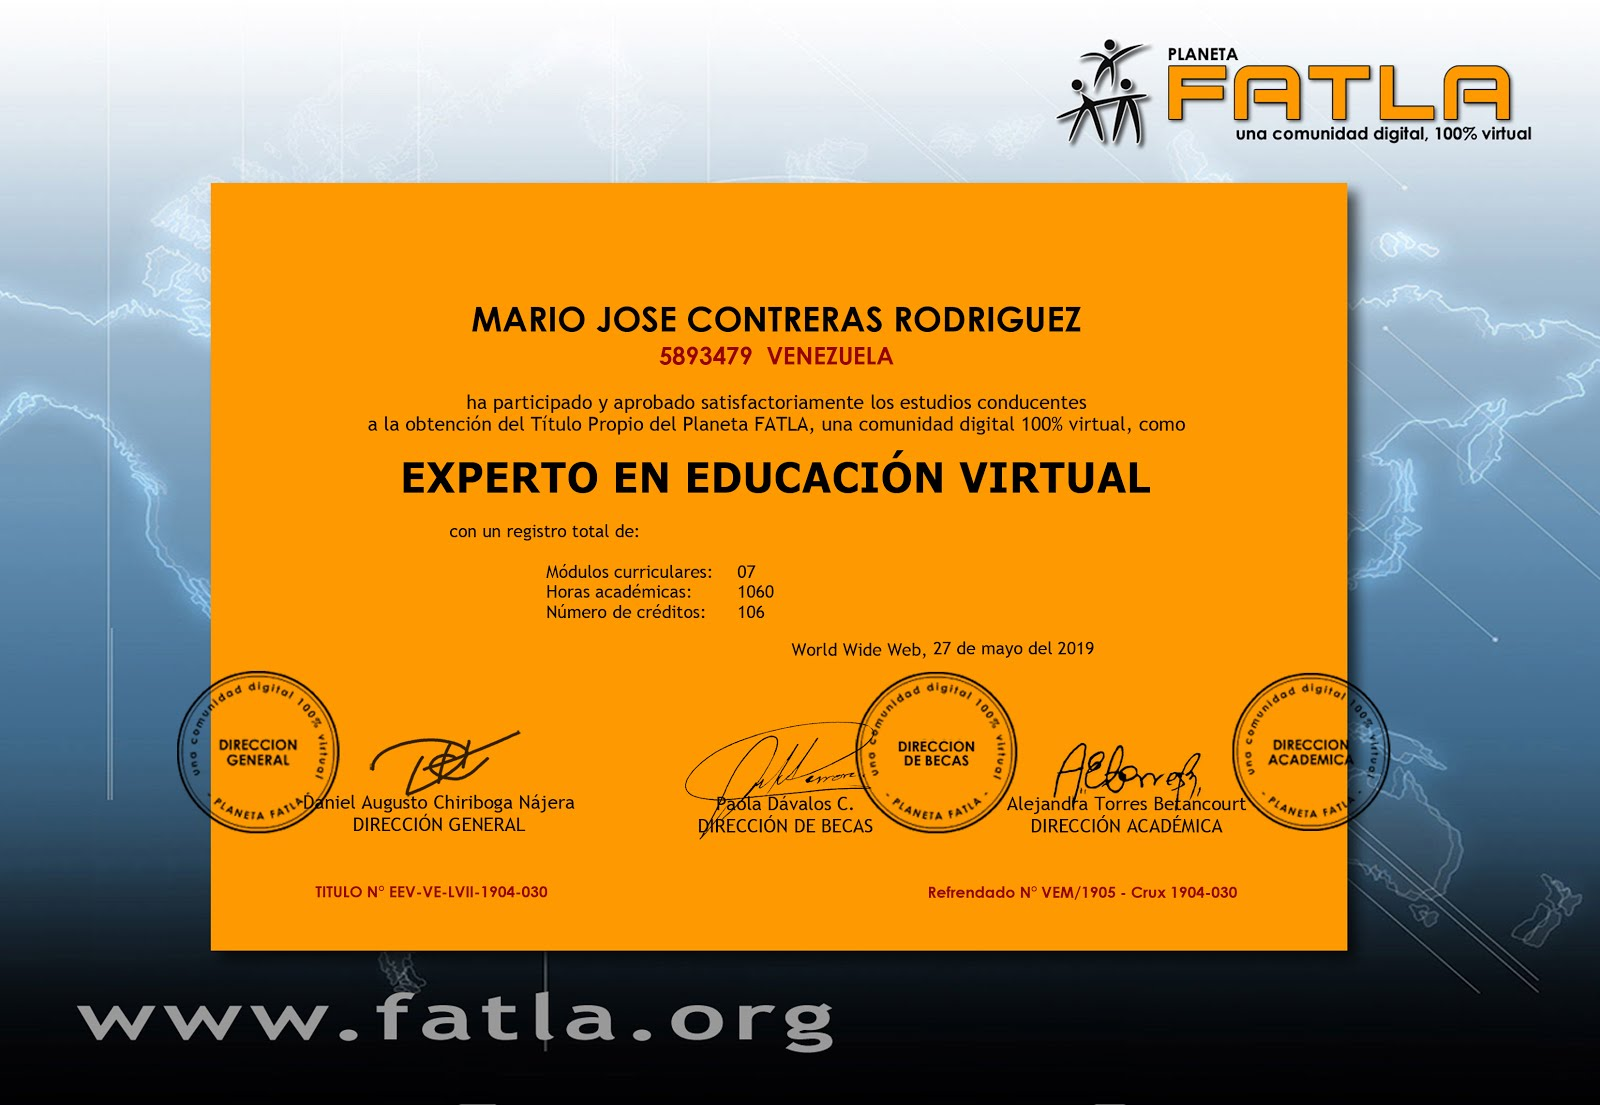 Programa Experto en Educación Virtual